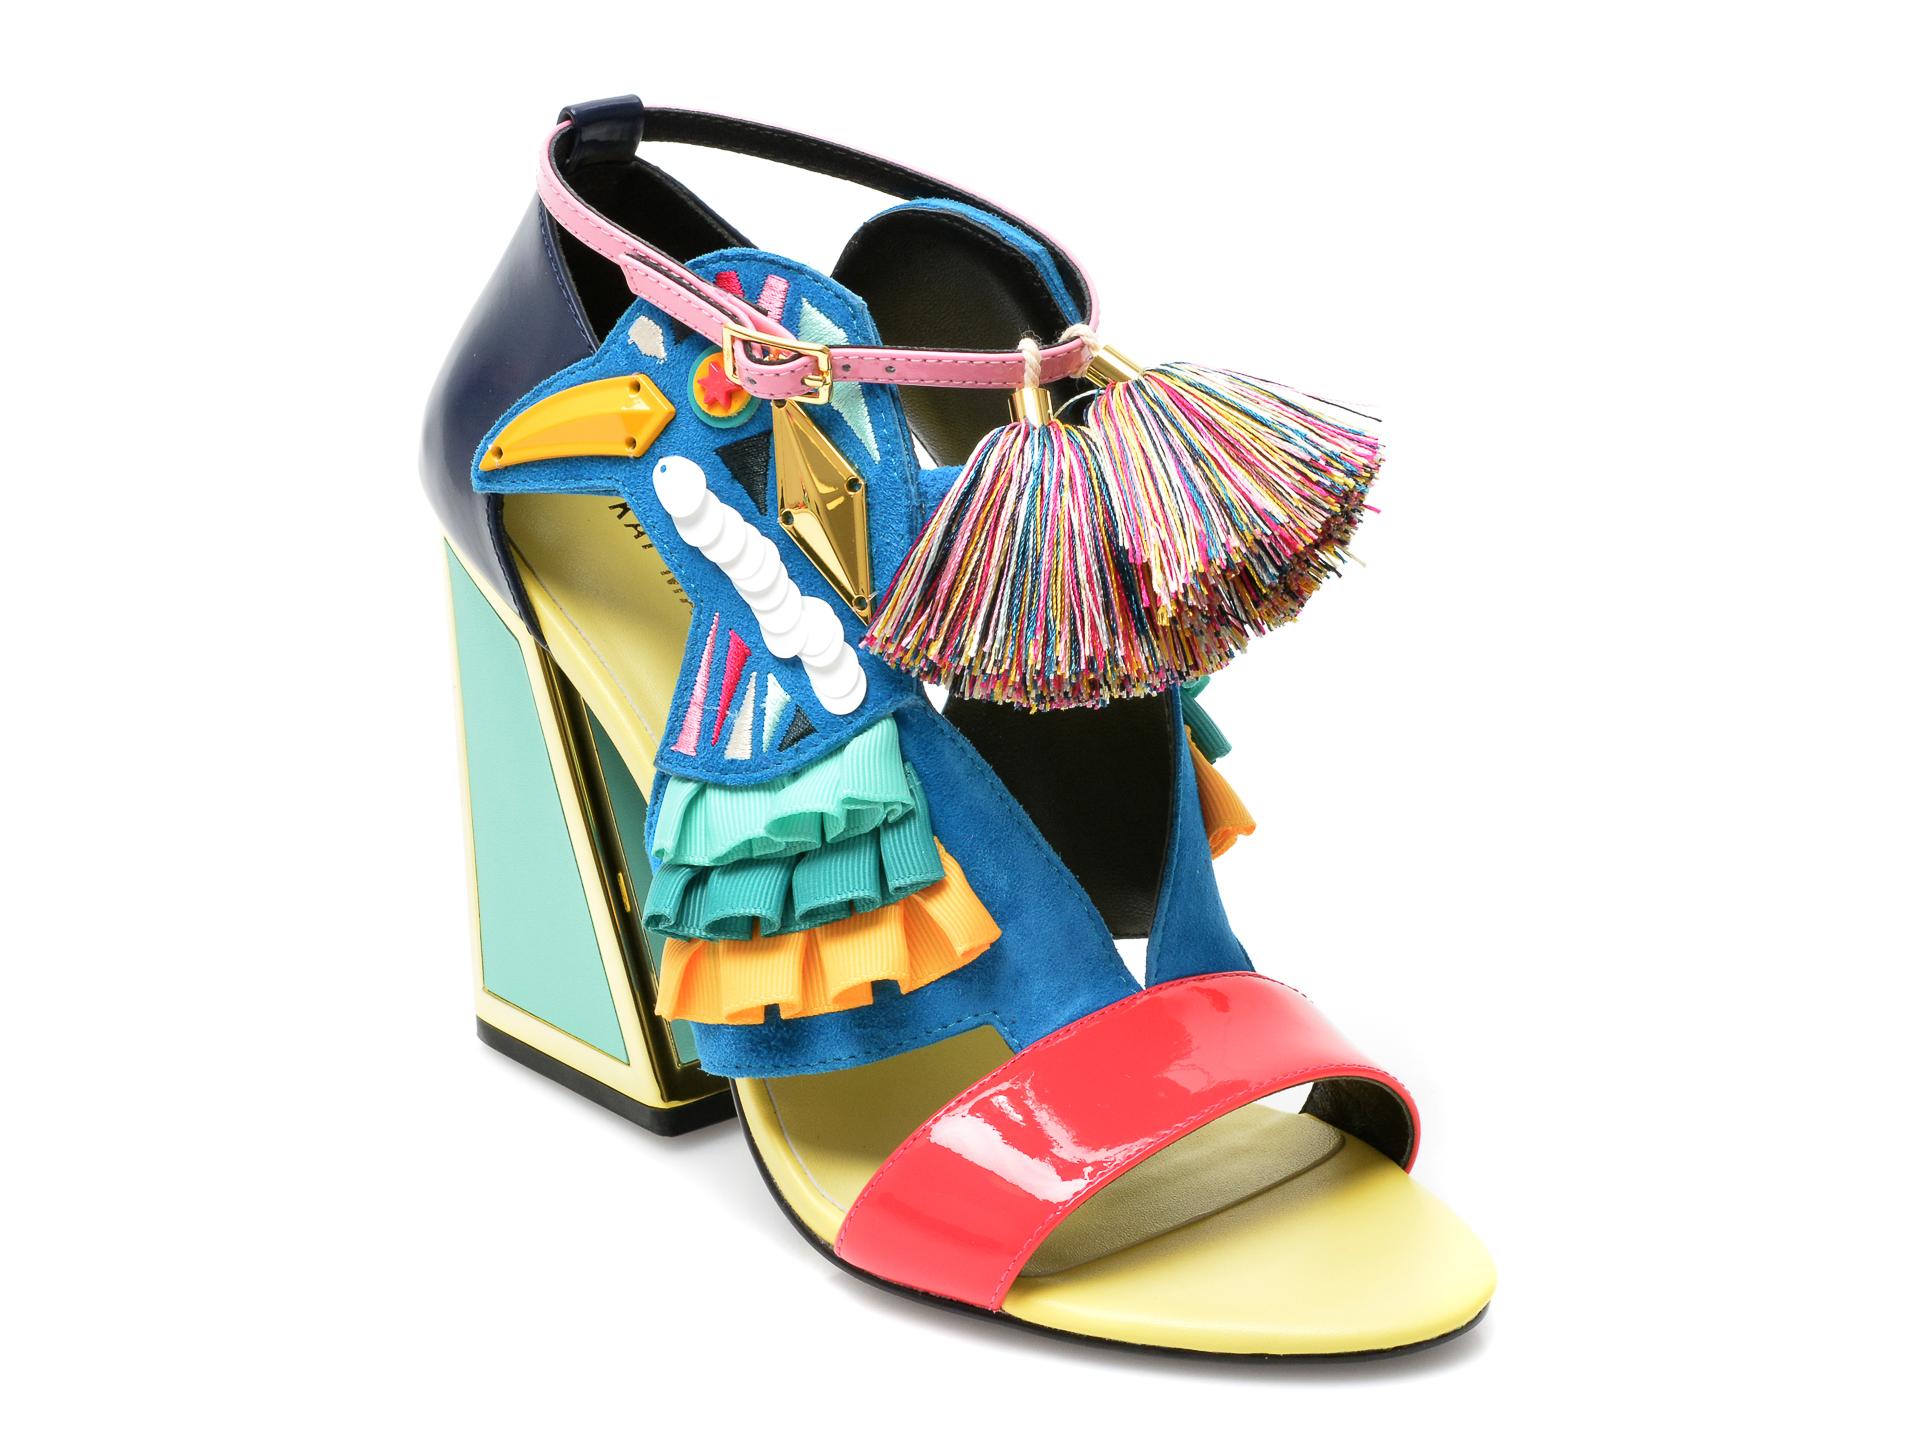 Sandale KAT MACONIE multicolore, AYA, din piele naturala